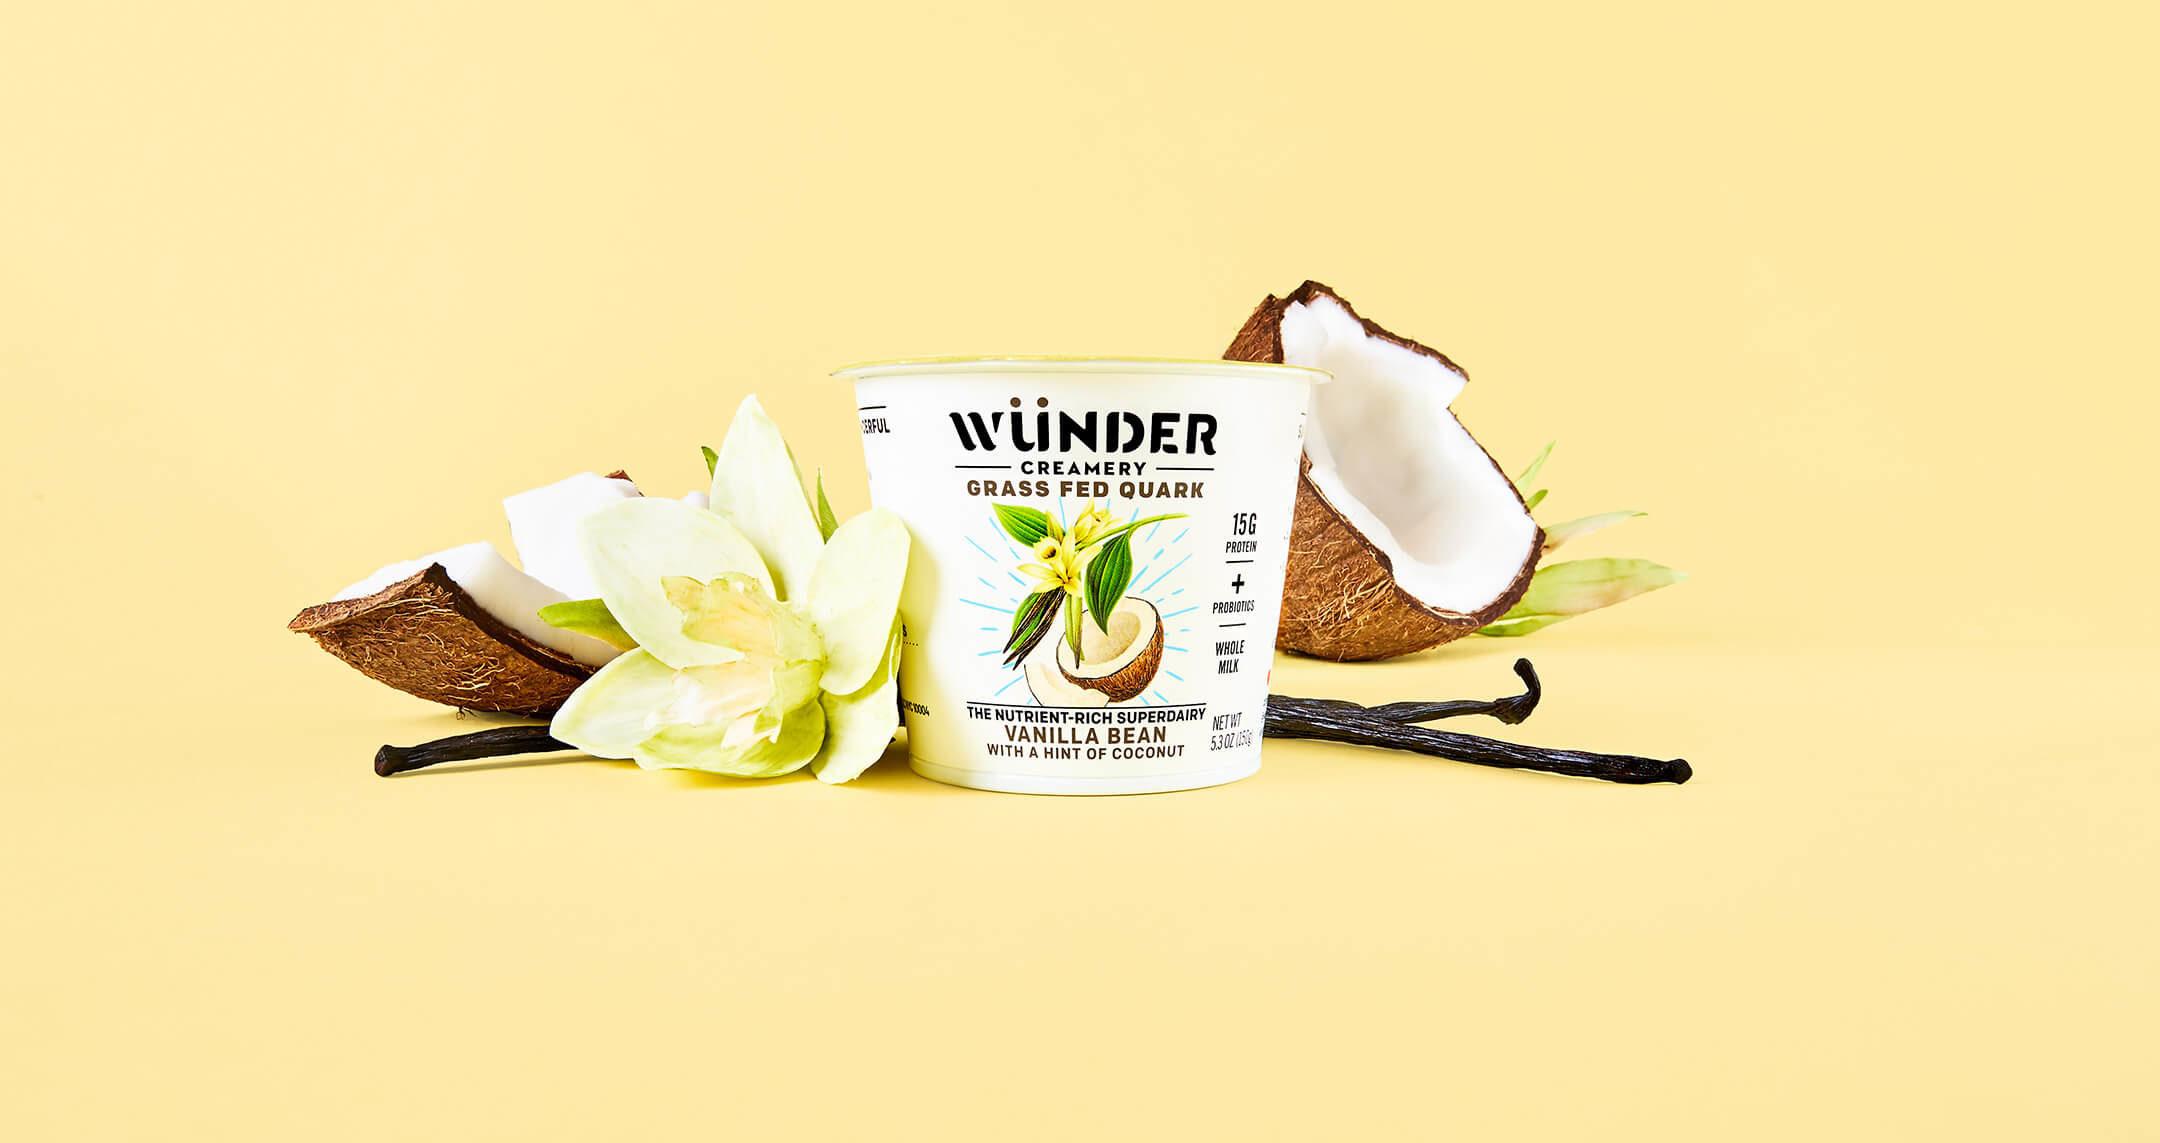 wunder creamery vanilla yogurt container with coconuts surrounding it